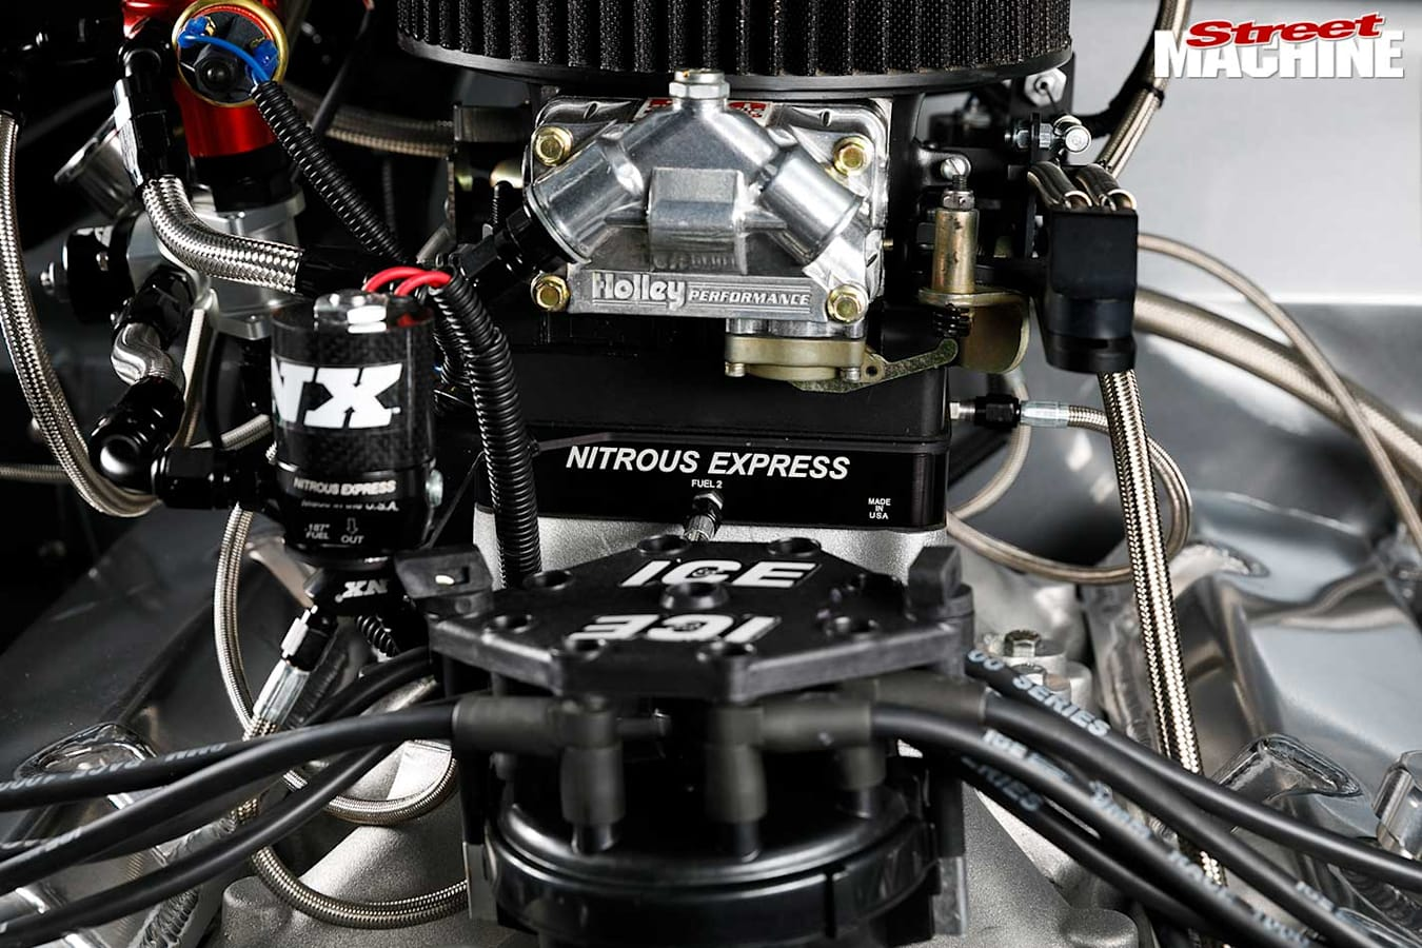 Ford Falcon XY ute engine bay